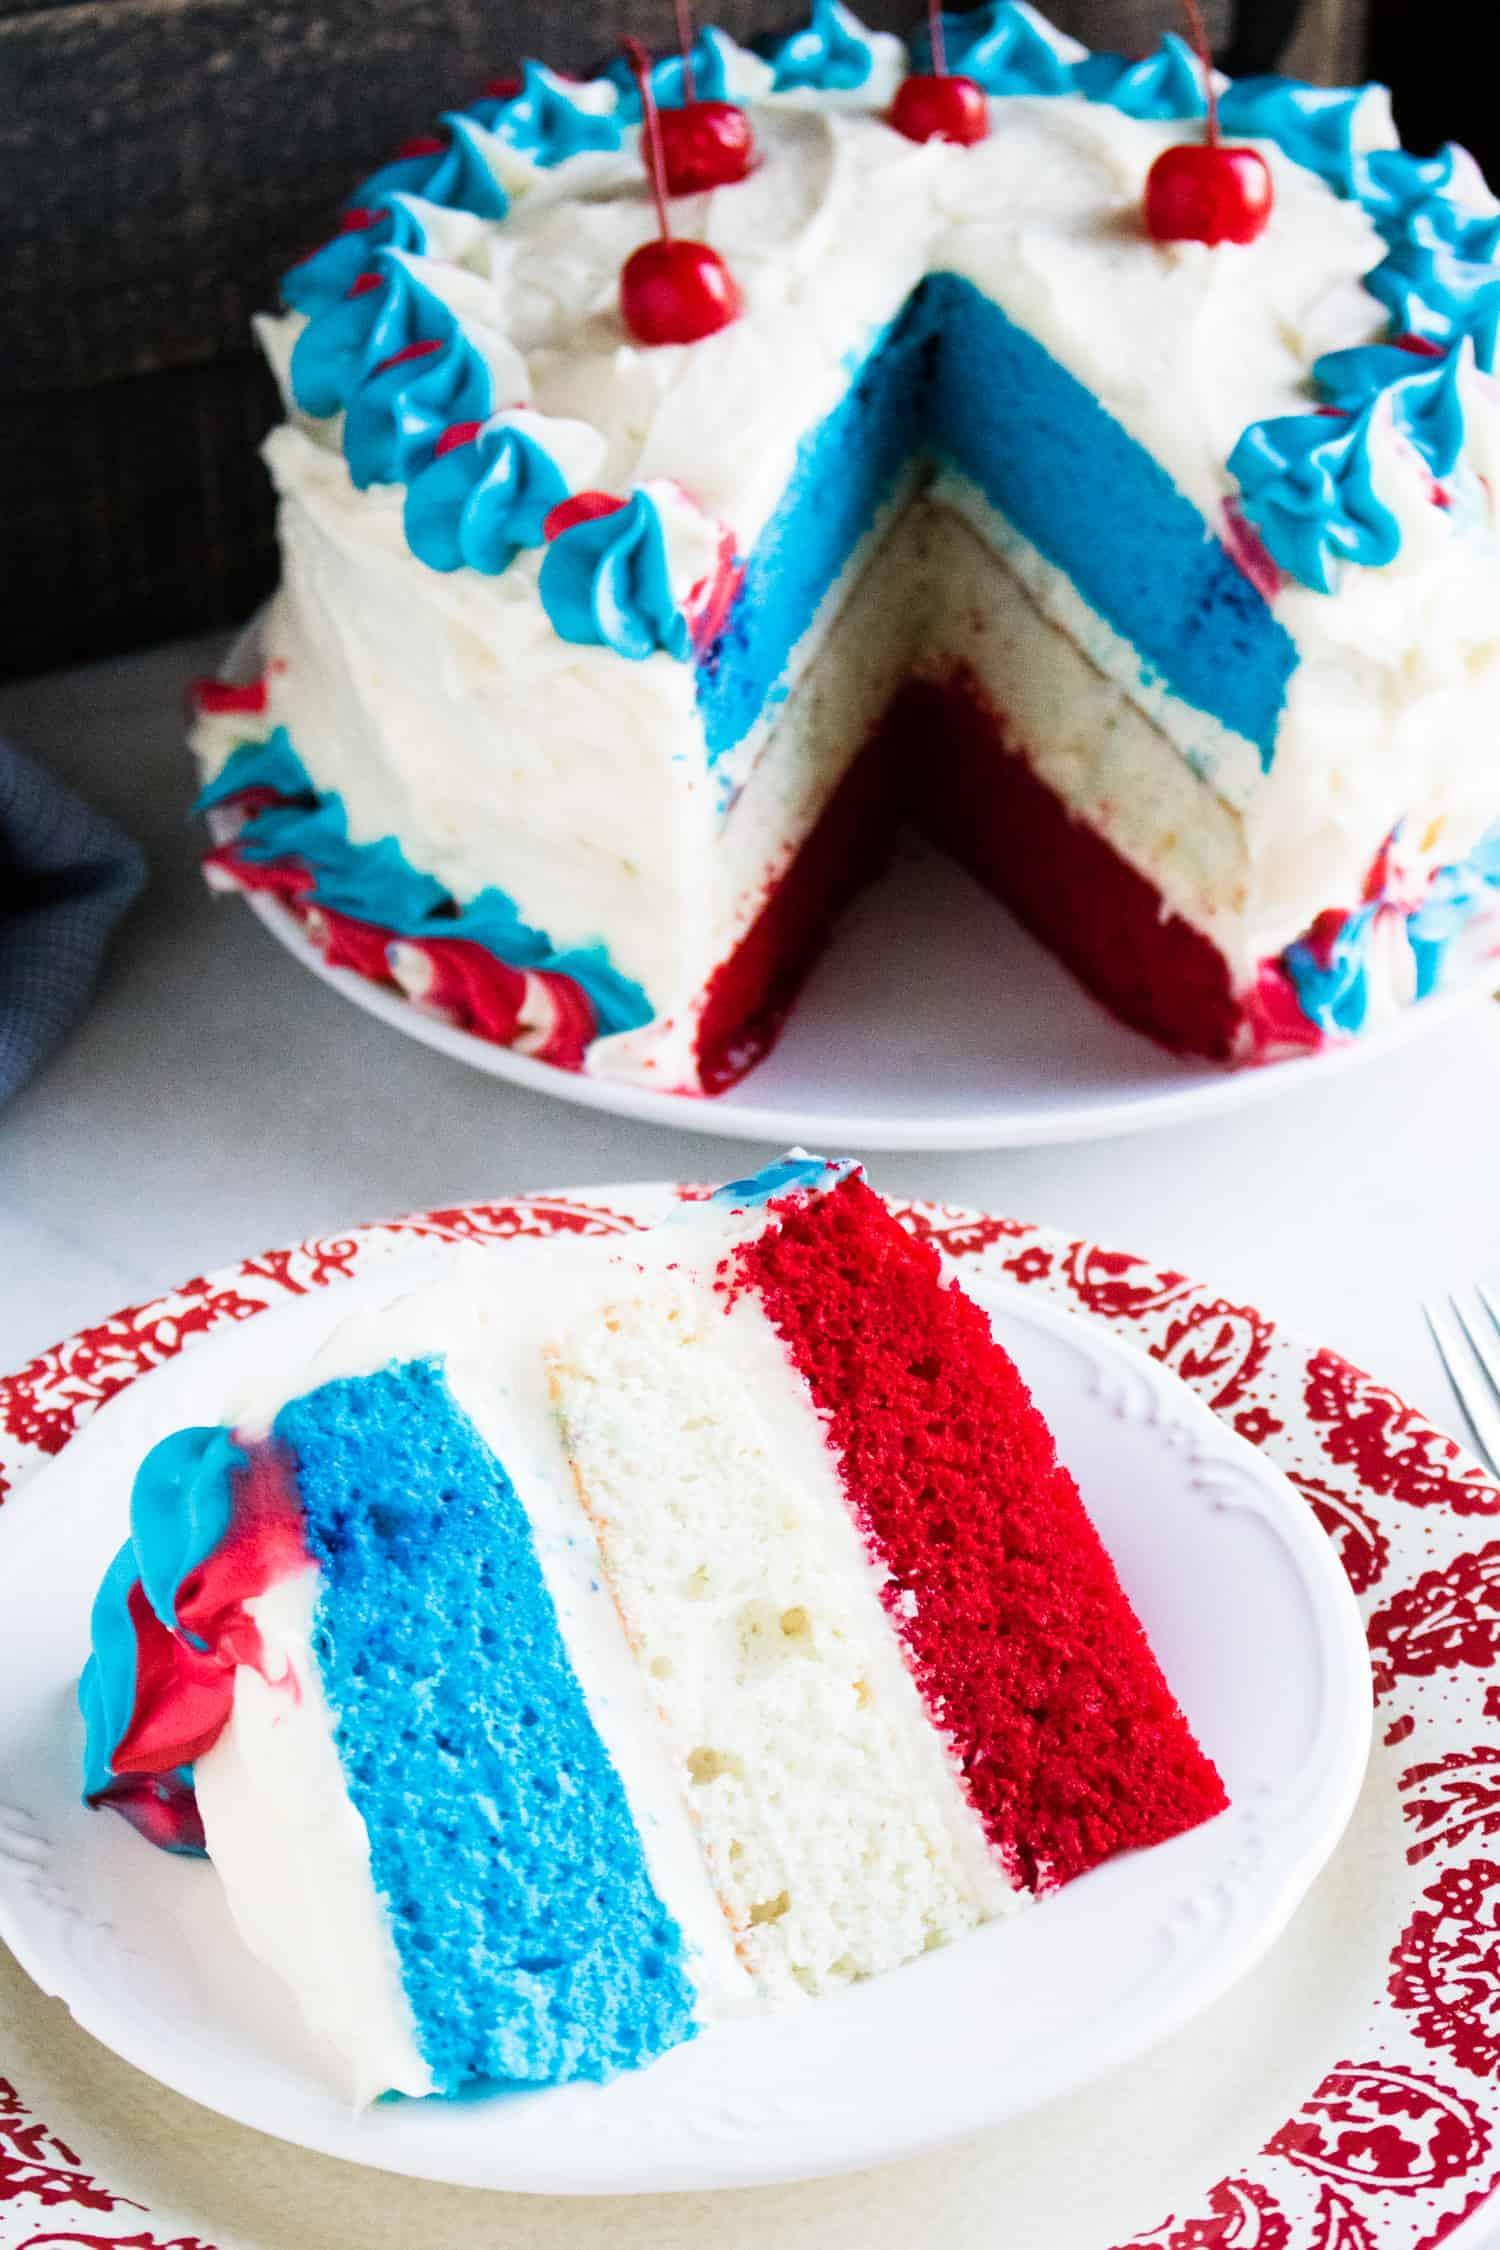 Red White and Blue Desserts | kimschob.com